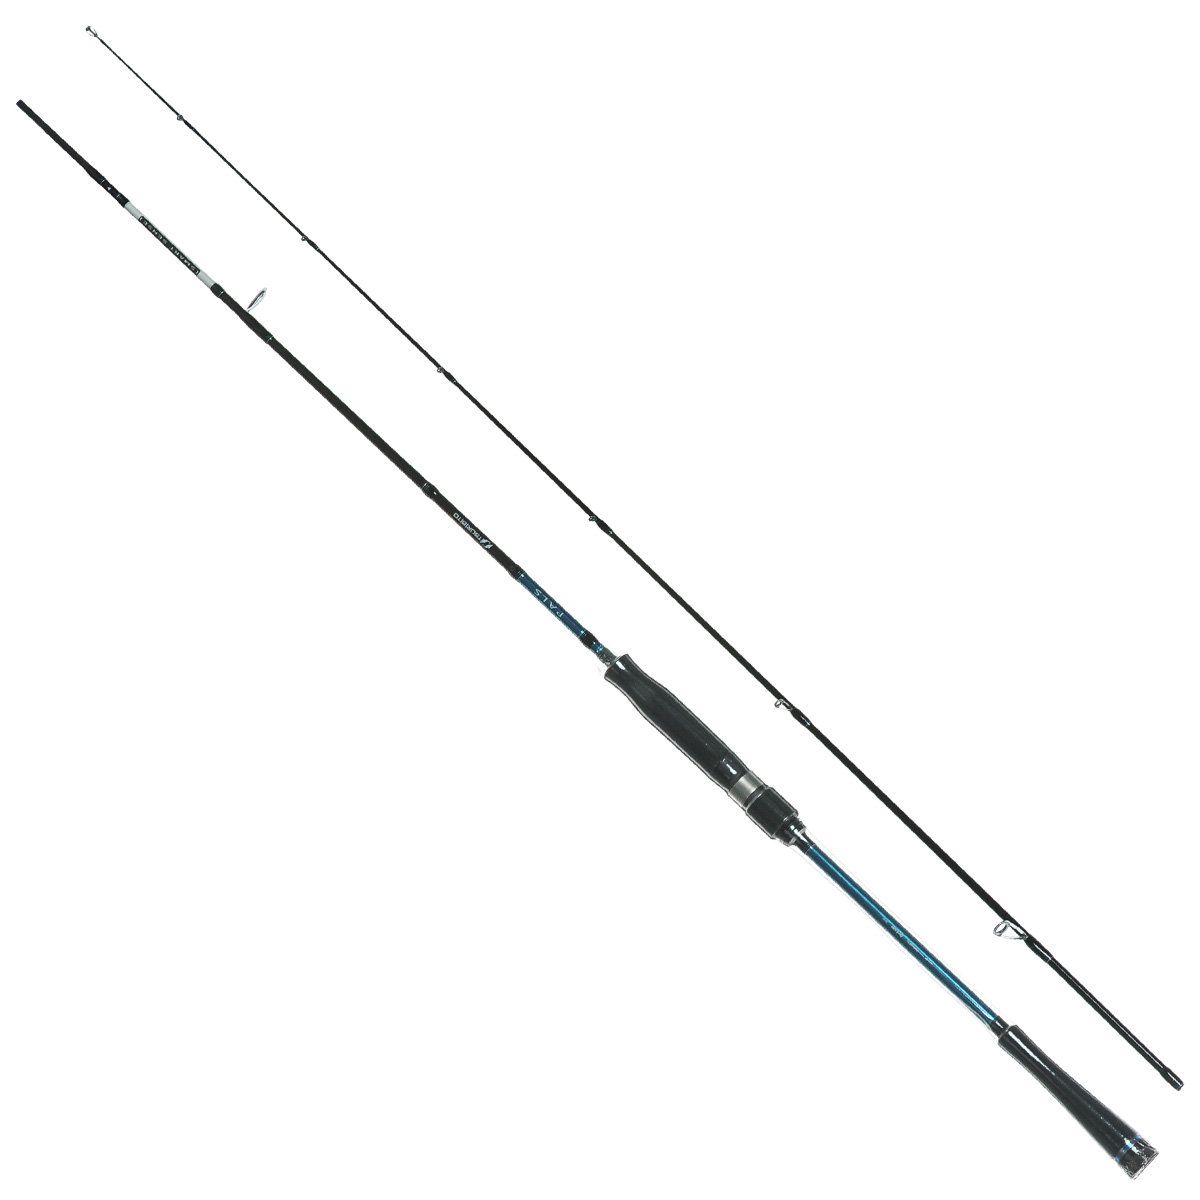 Удилище спиннинговое Tsuribito-Jackson Pals, 1,91 м, 5-18 г